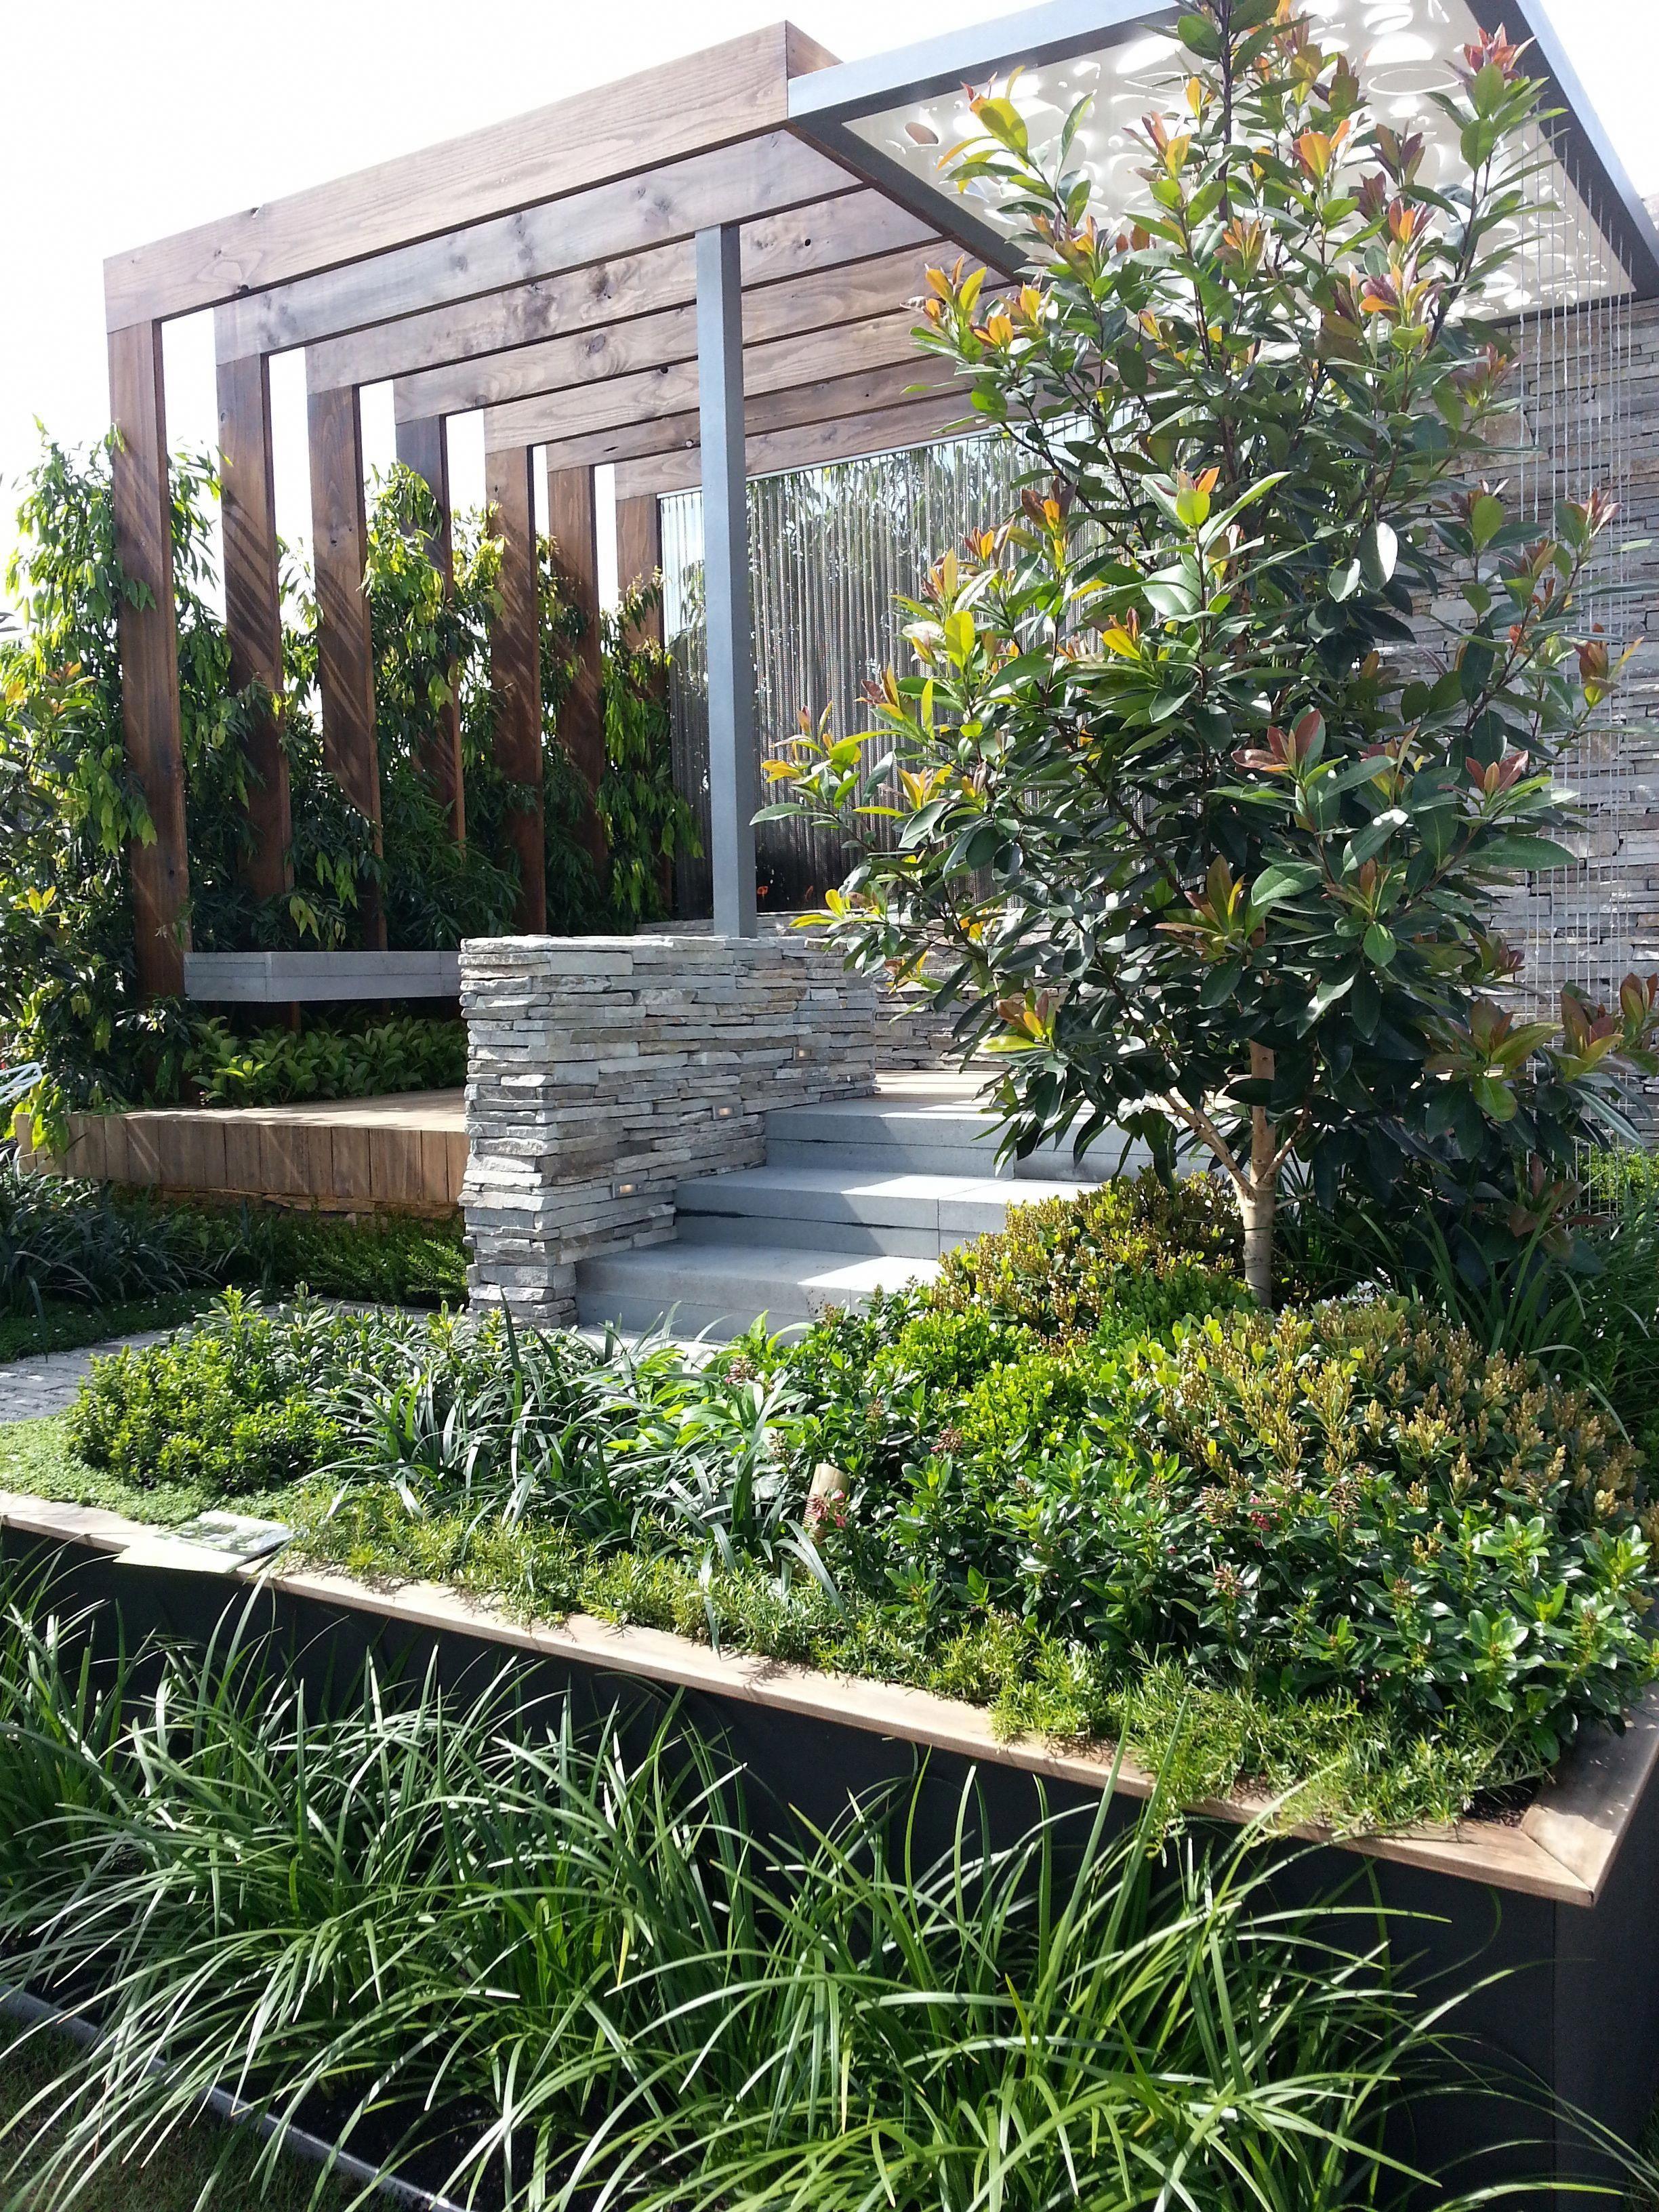 Landscape Gardening Bath Sloped Garden Modern Garden Landscape Design Modern backyard landscaping ideas australia